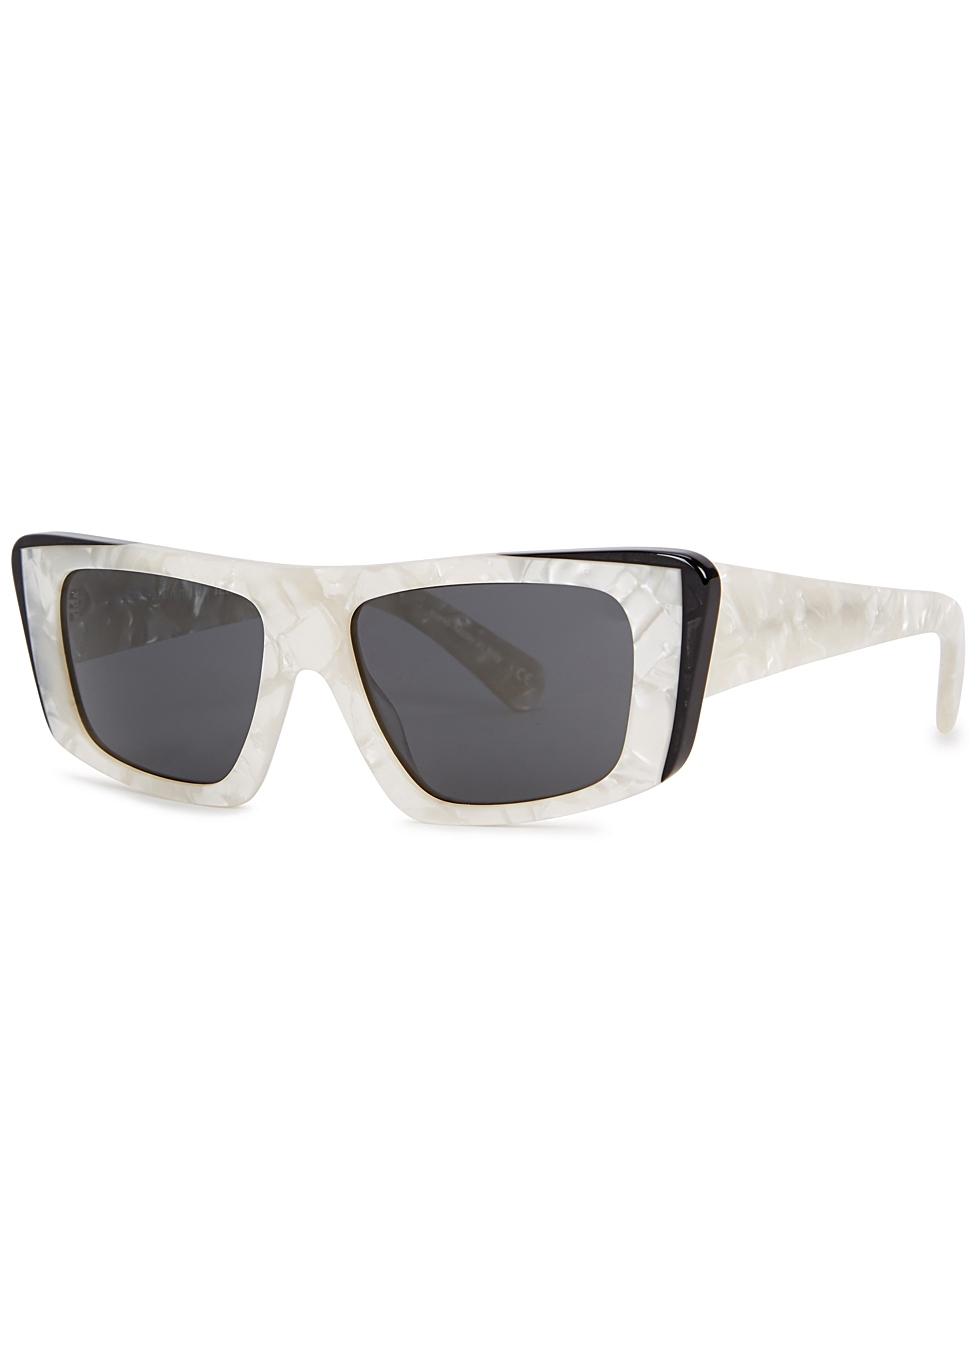 Jeremy Mikli Harvey X Nichols Rectangle Sunglasses Scott Alain Frame m80wvNn